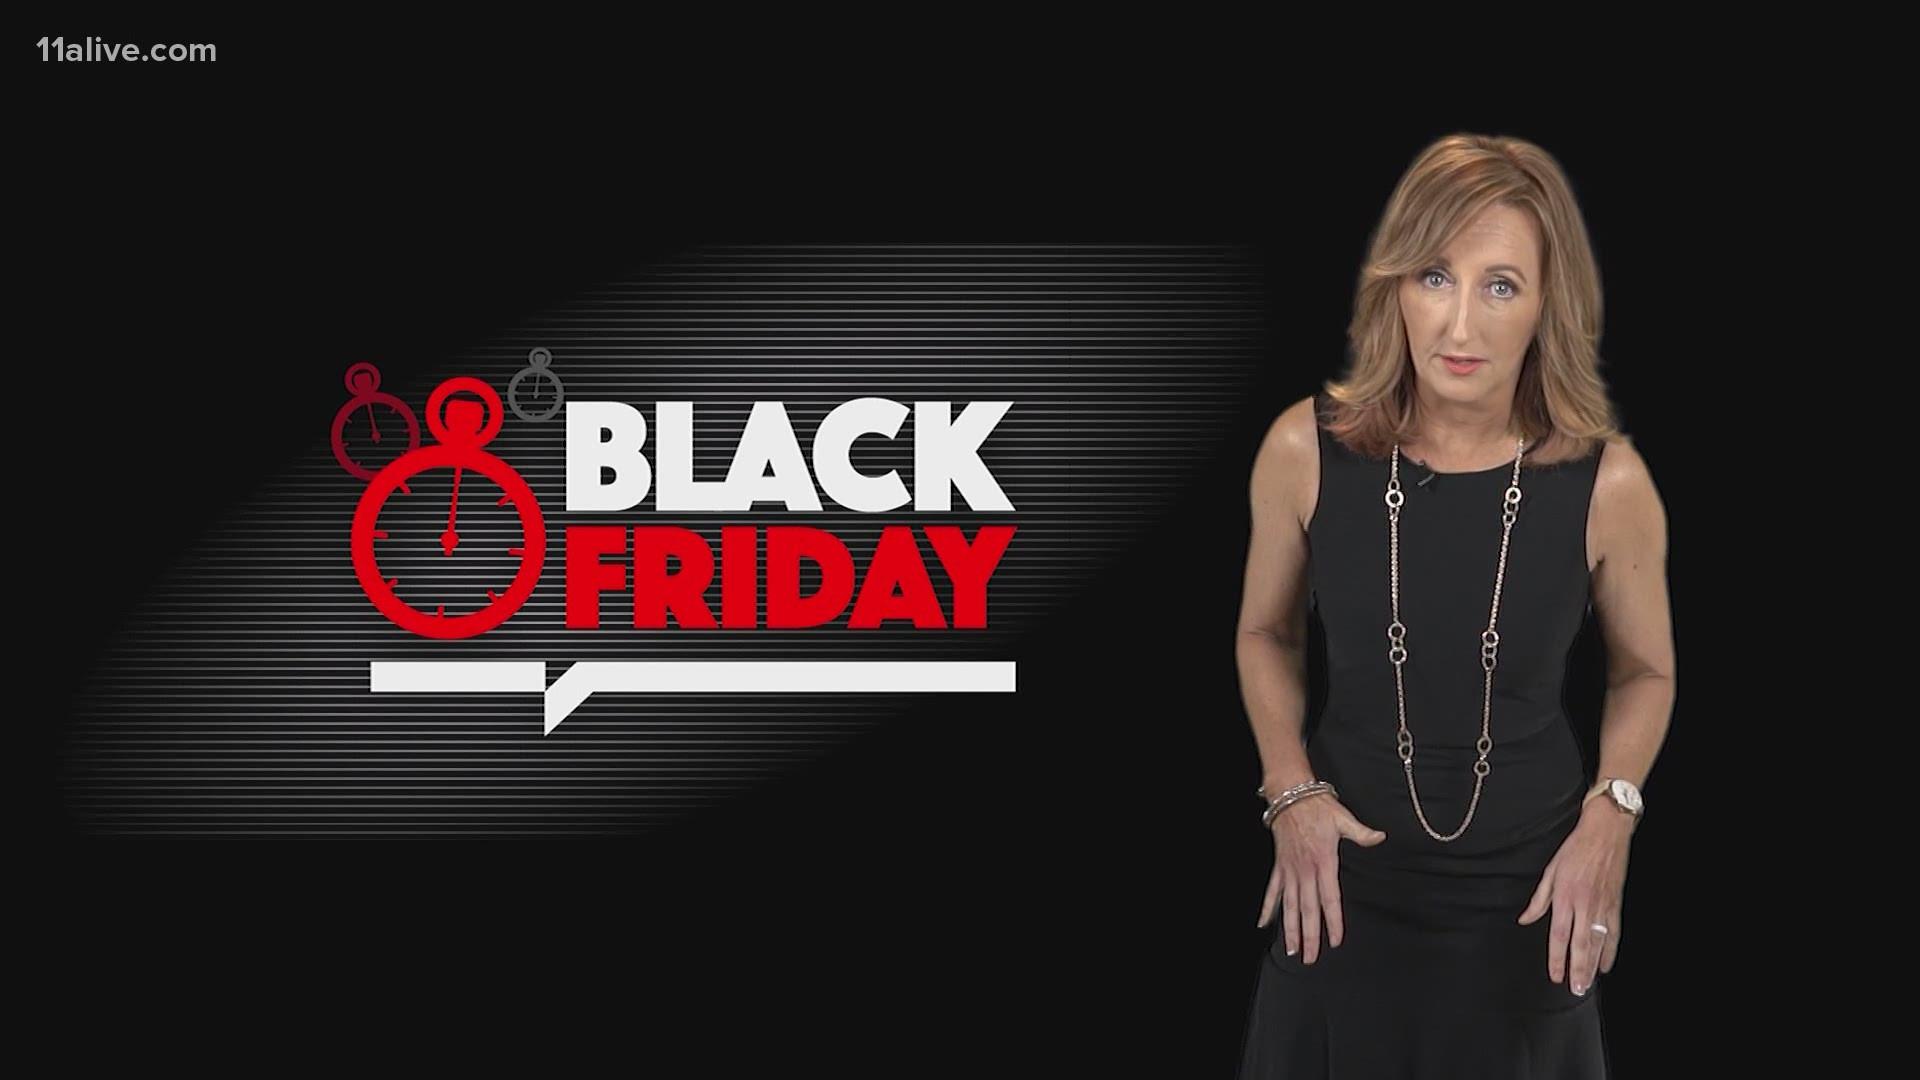 Target Black Friday Ad 2020 Deals Kick Off Sunday Kare11 Com